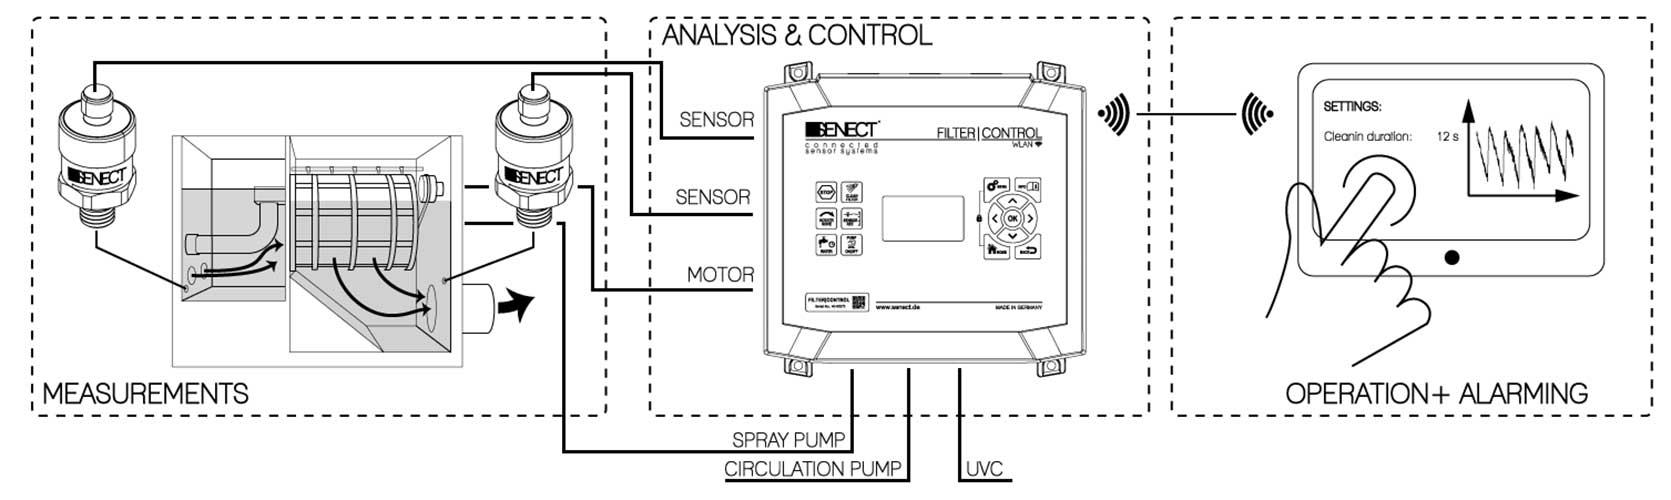 Senect Filter Control Schema